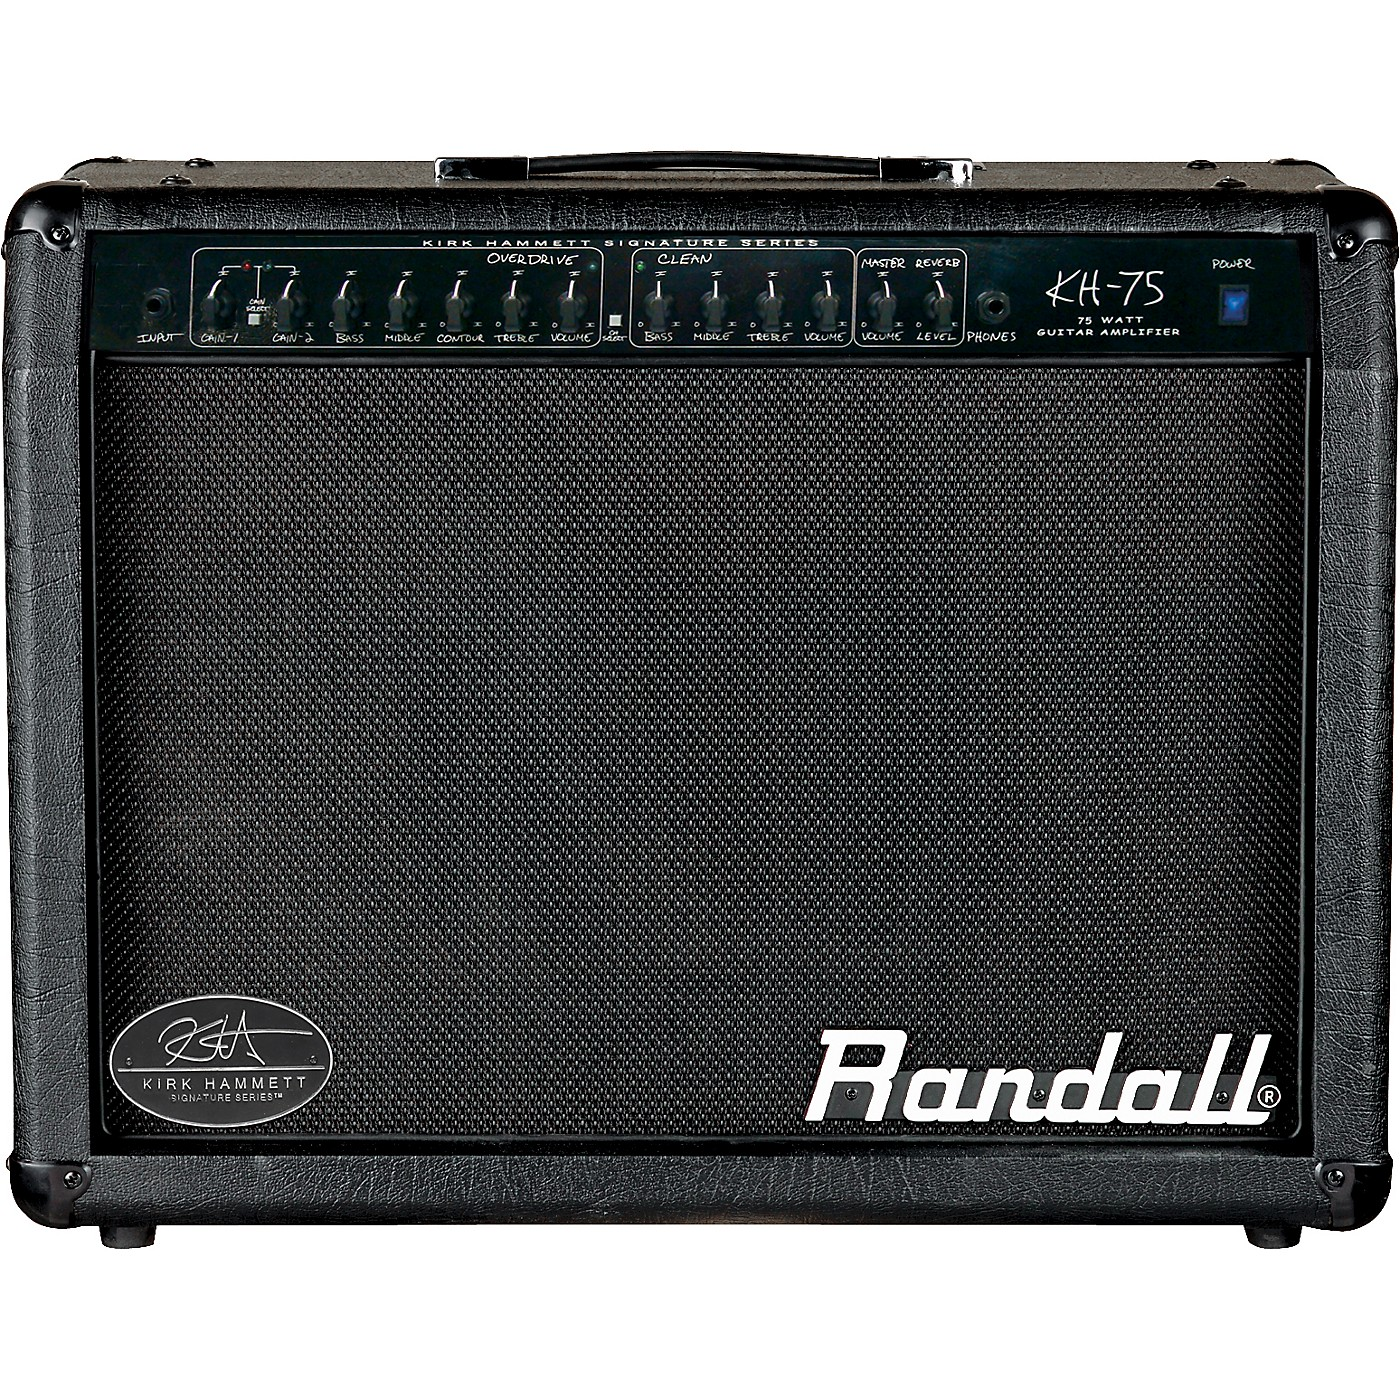 Randall Kirk Hammett KH75 75W 1x12 Guitar Combo Amp thumbnail